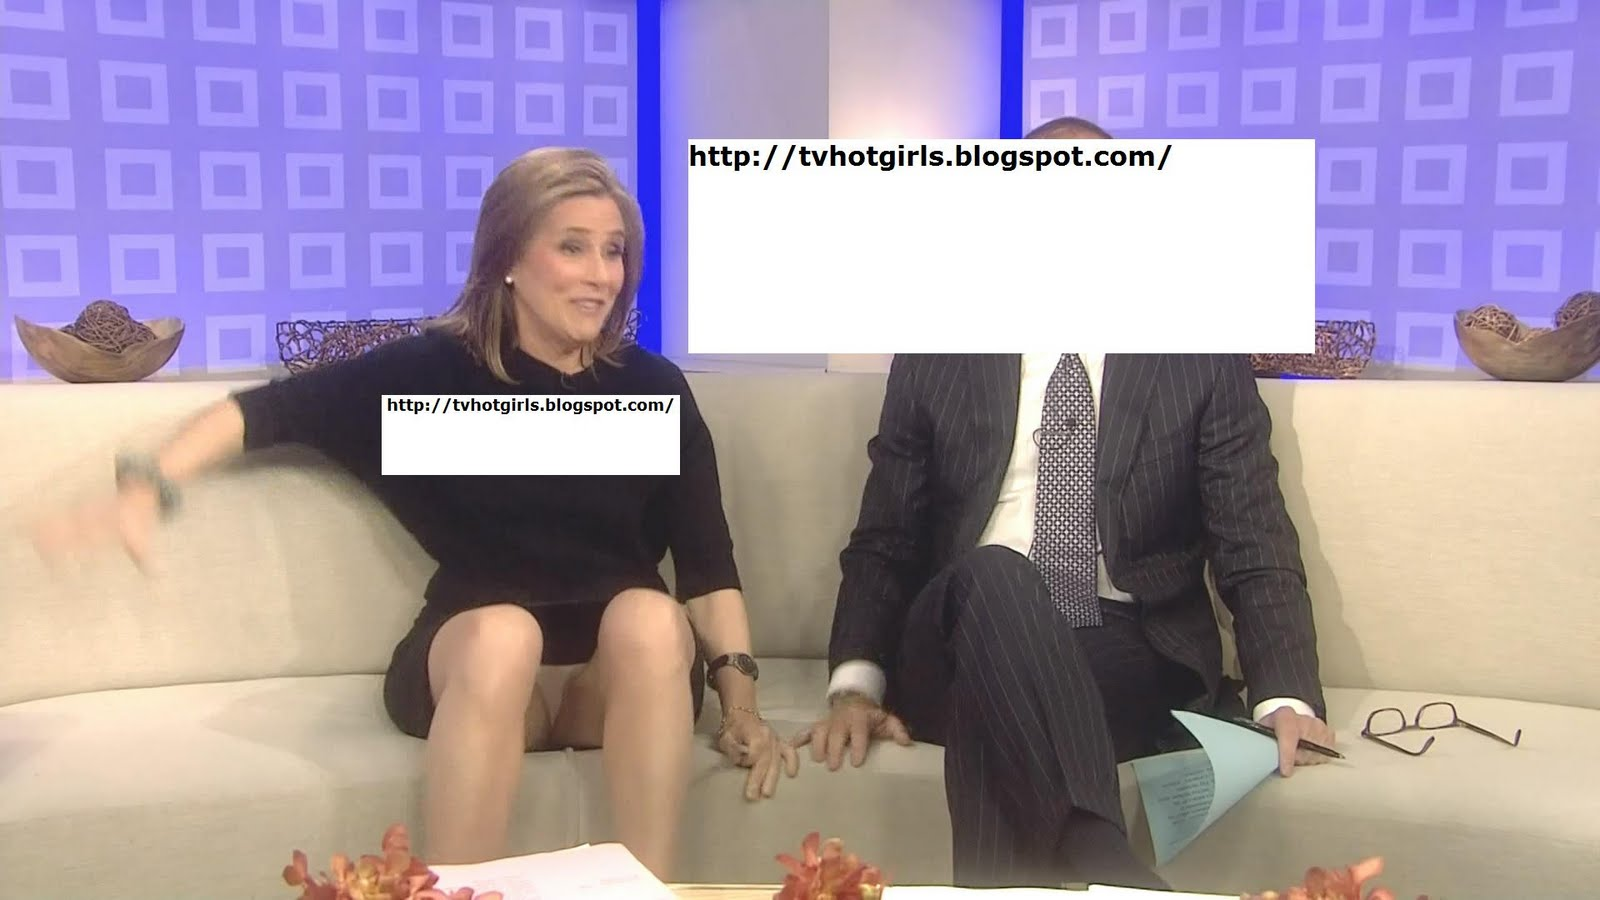 Meredith Vieira Upskirt Panties Hd Picture